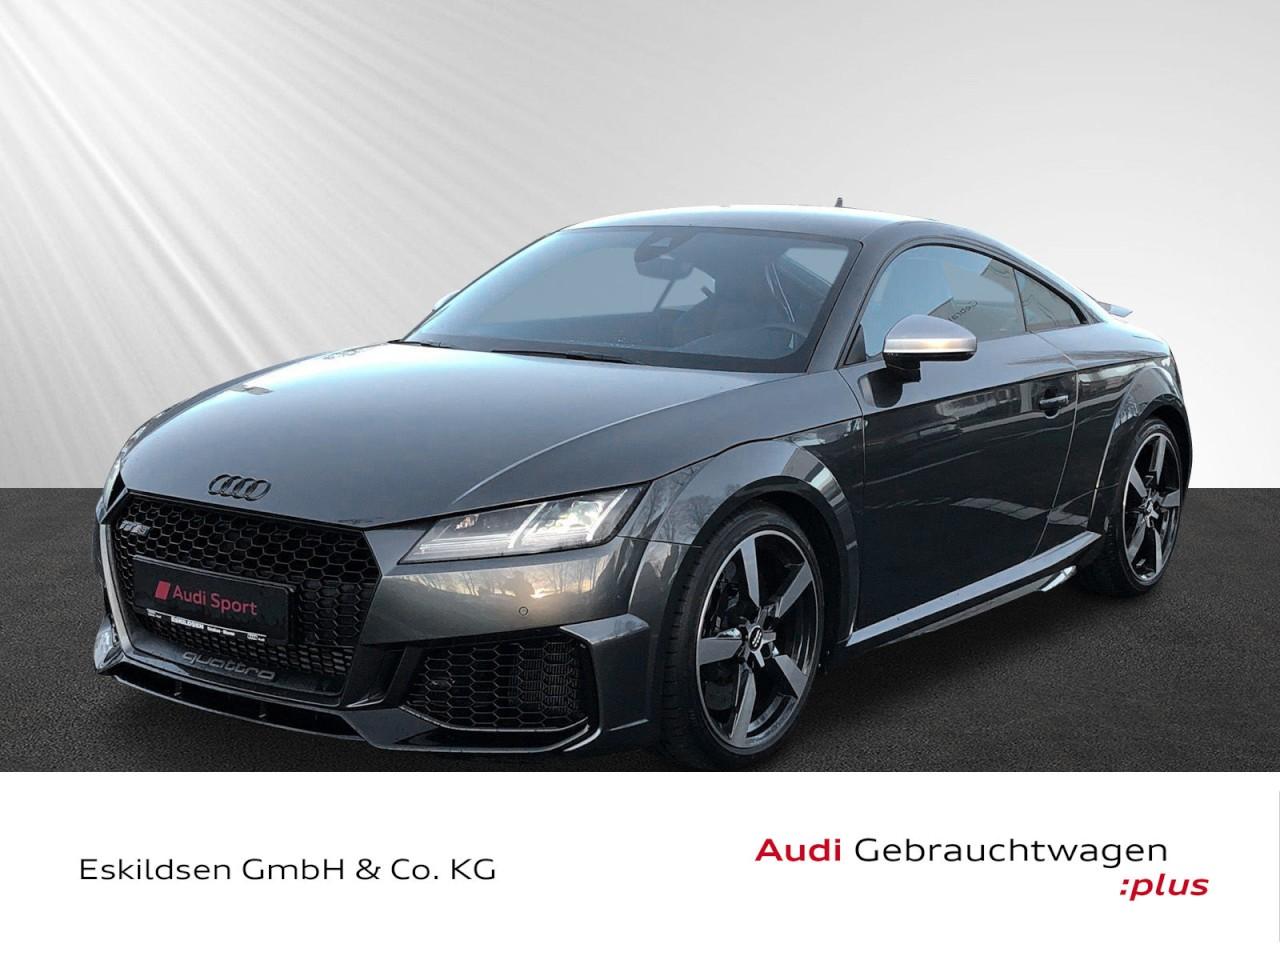 Audi TT RS Coupé 2,5 TFSI quattro RS-AbGasan., Navi Plus, Jahr 2019, Benzin